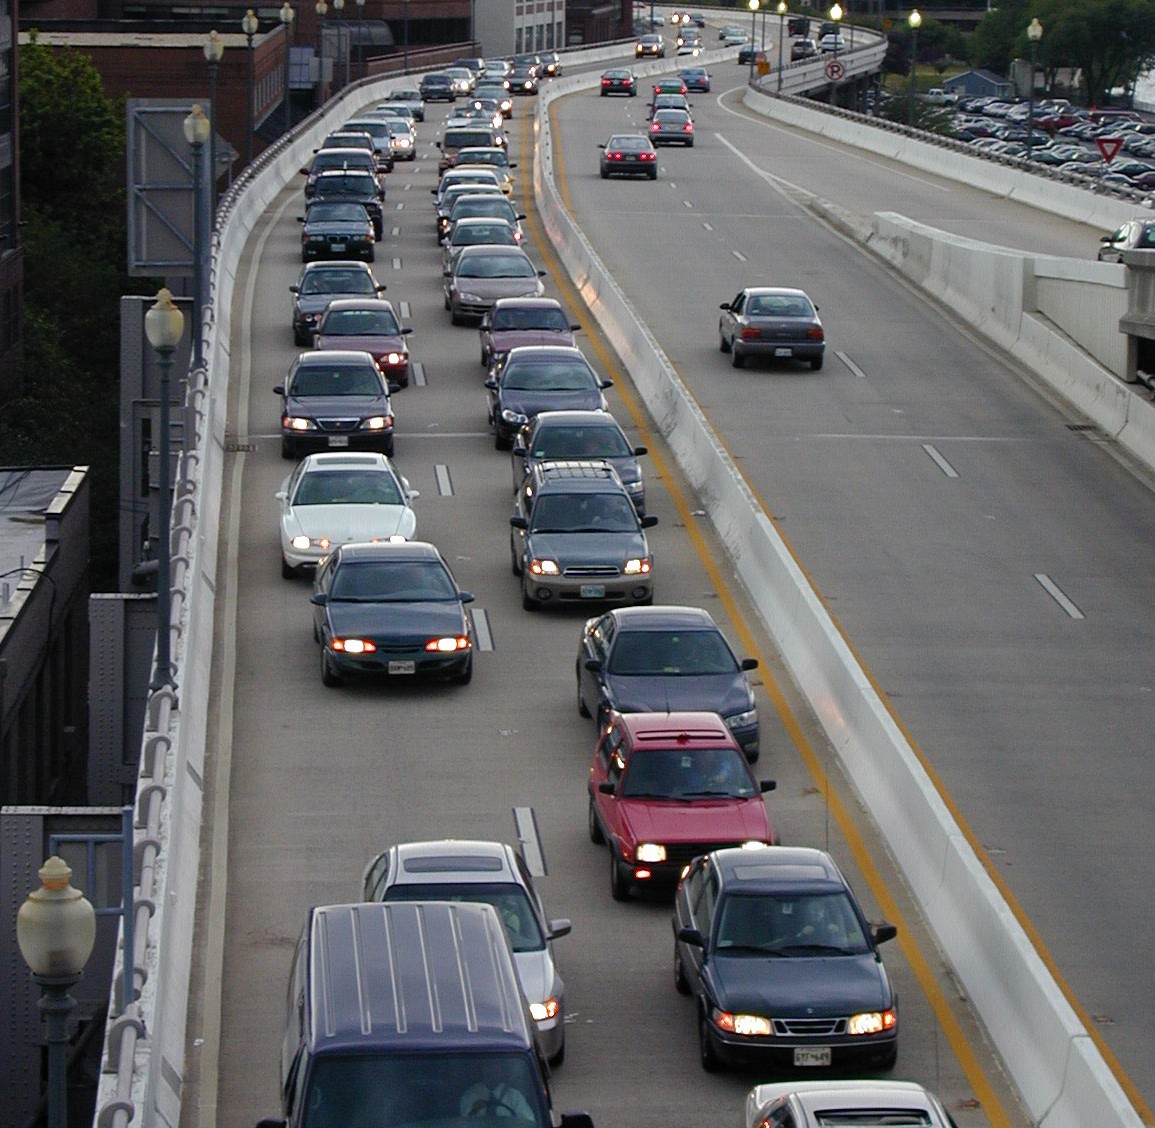 e2bd91daa451687ee28c_Highway_Traffic__AAA_Foundation_for_Traffic_Safety_.jpg